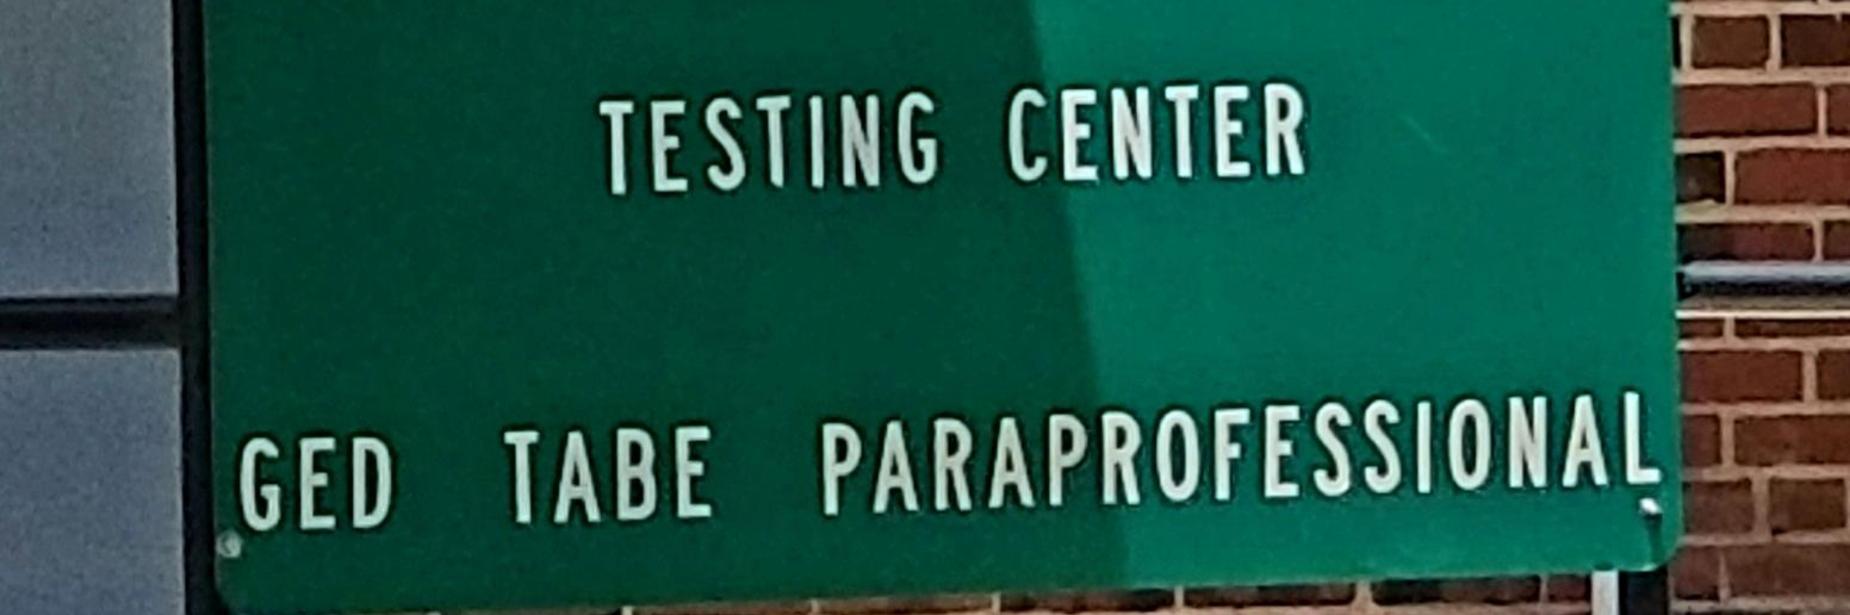 adult ed testing center sign